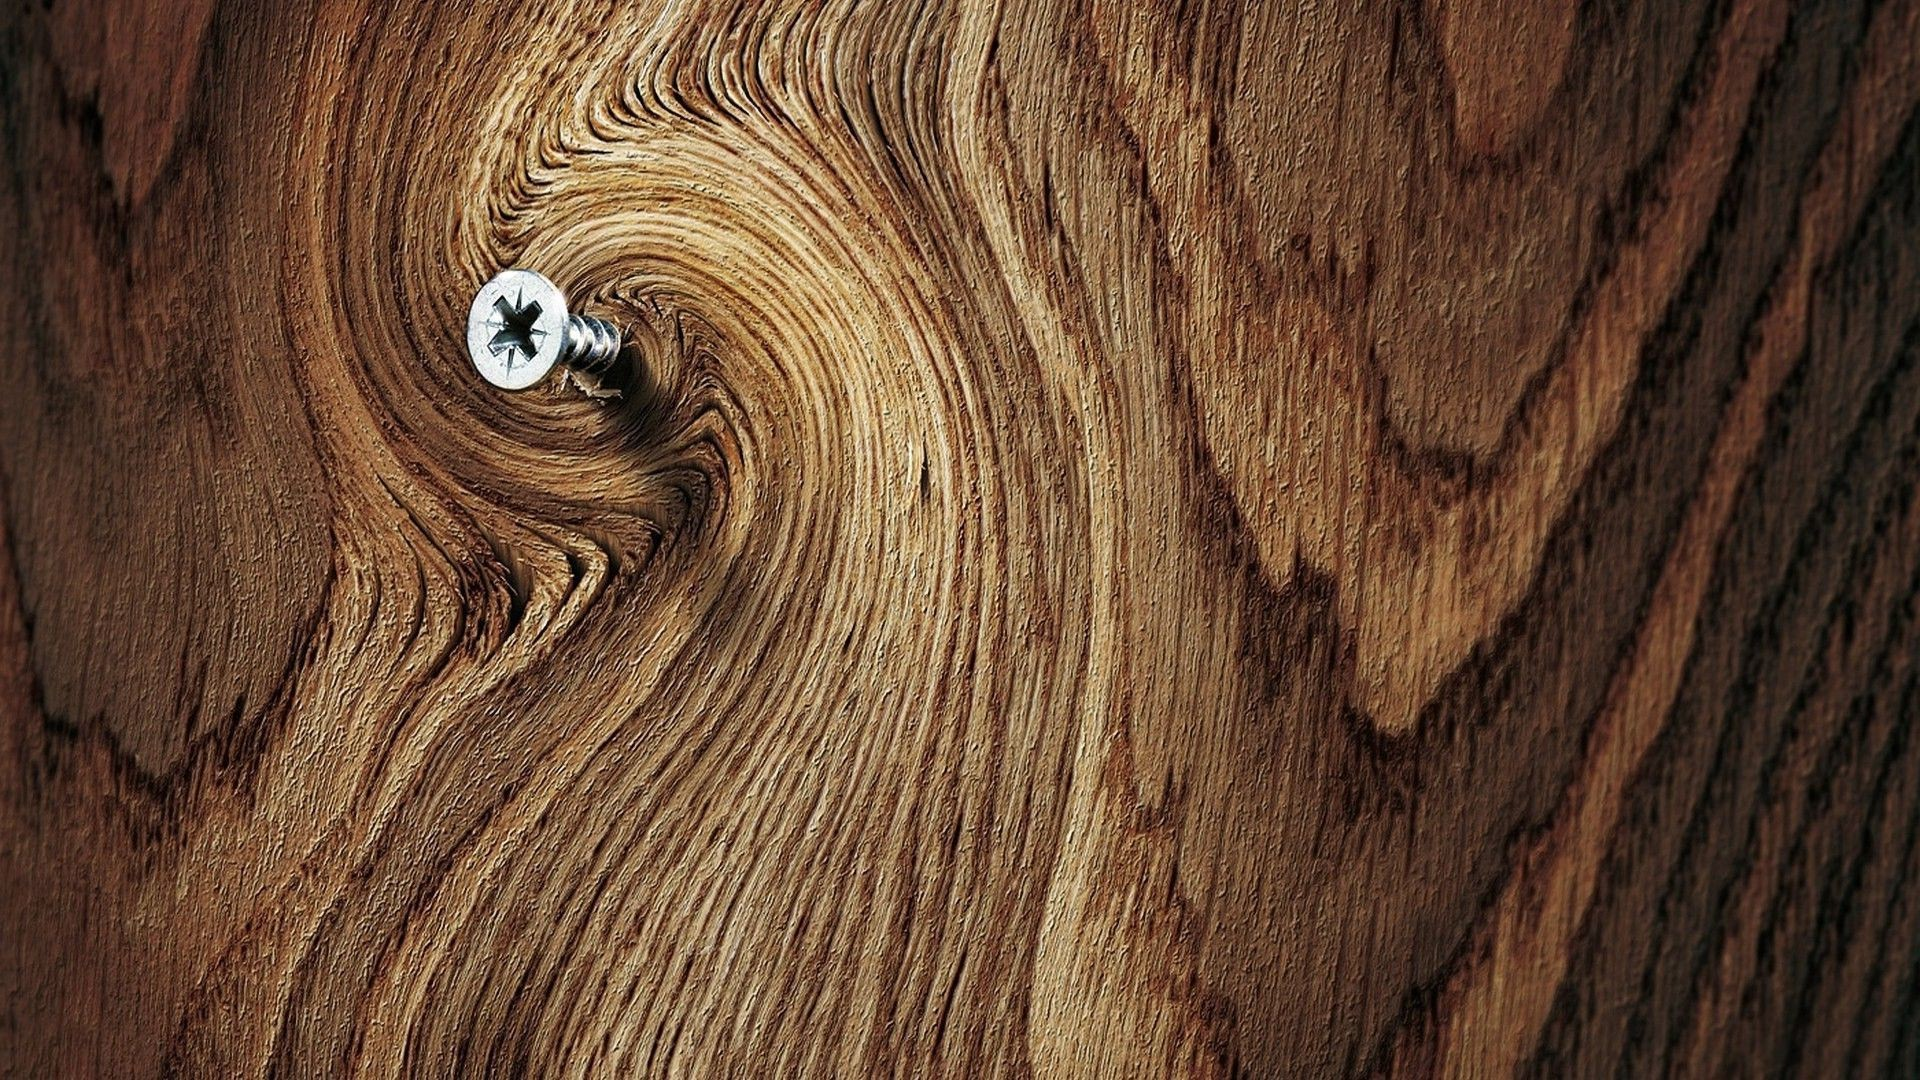 High Resolution Wood Tree Wallpaper 1920?1080 Full Size .